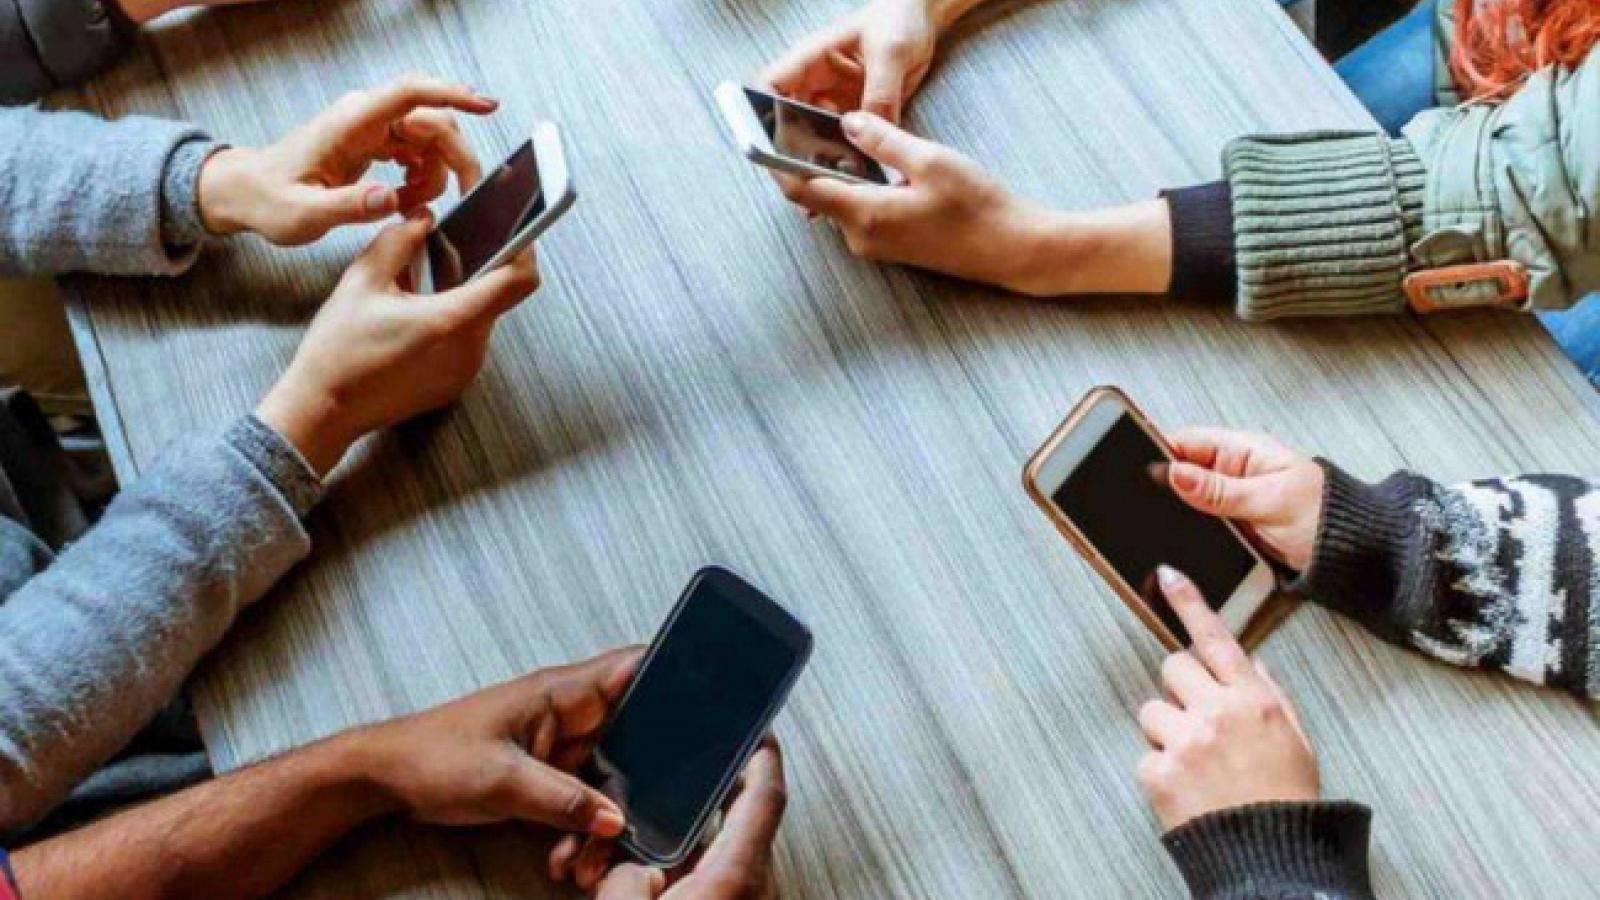 Global mobile network speed rankings sees Vietnam rise 10 spots